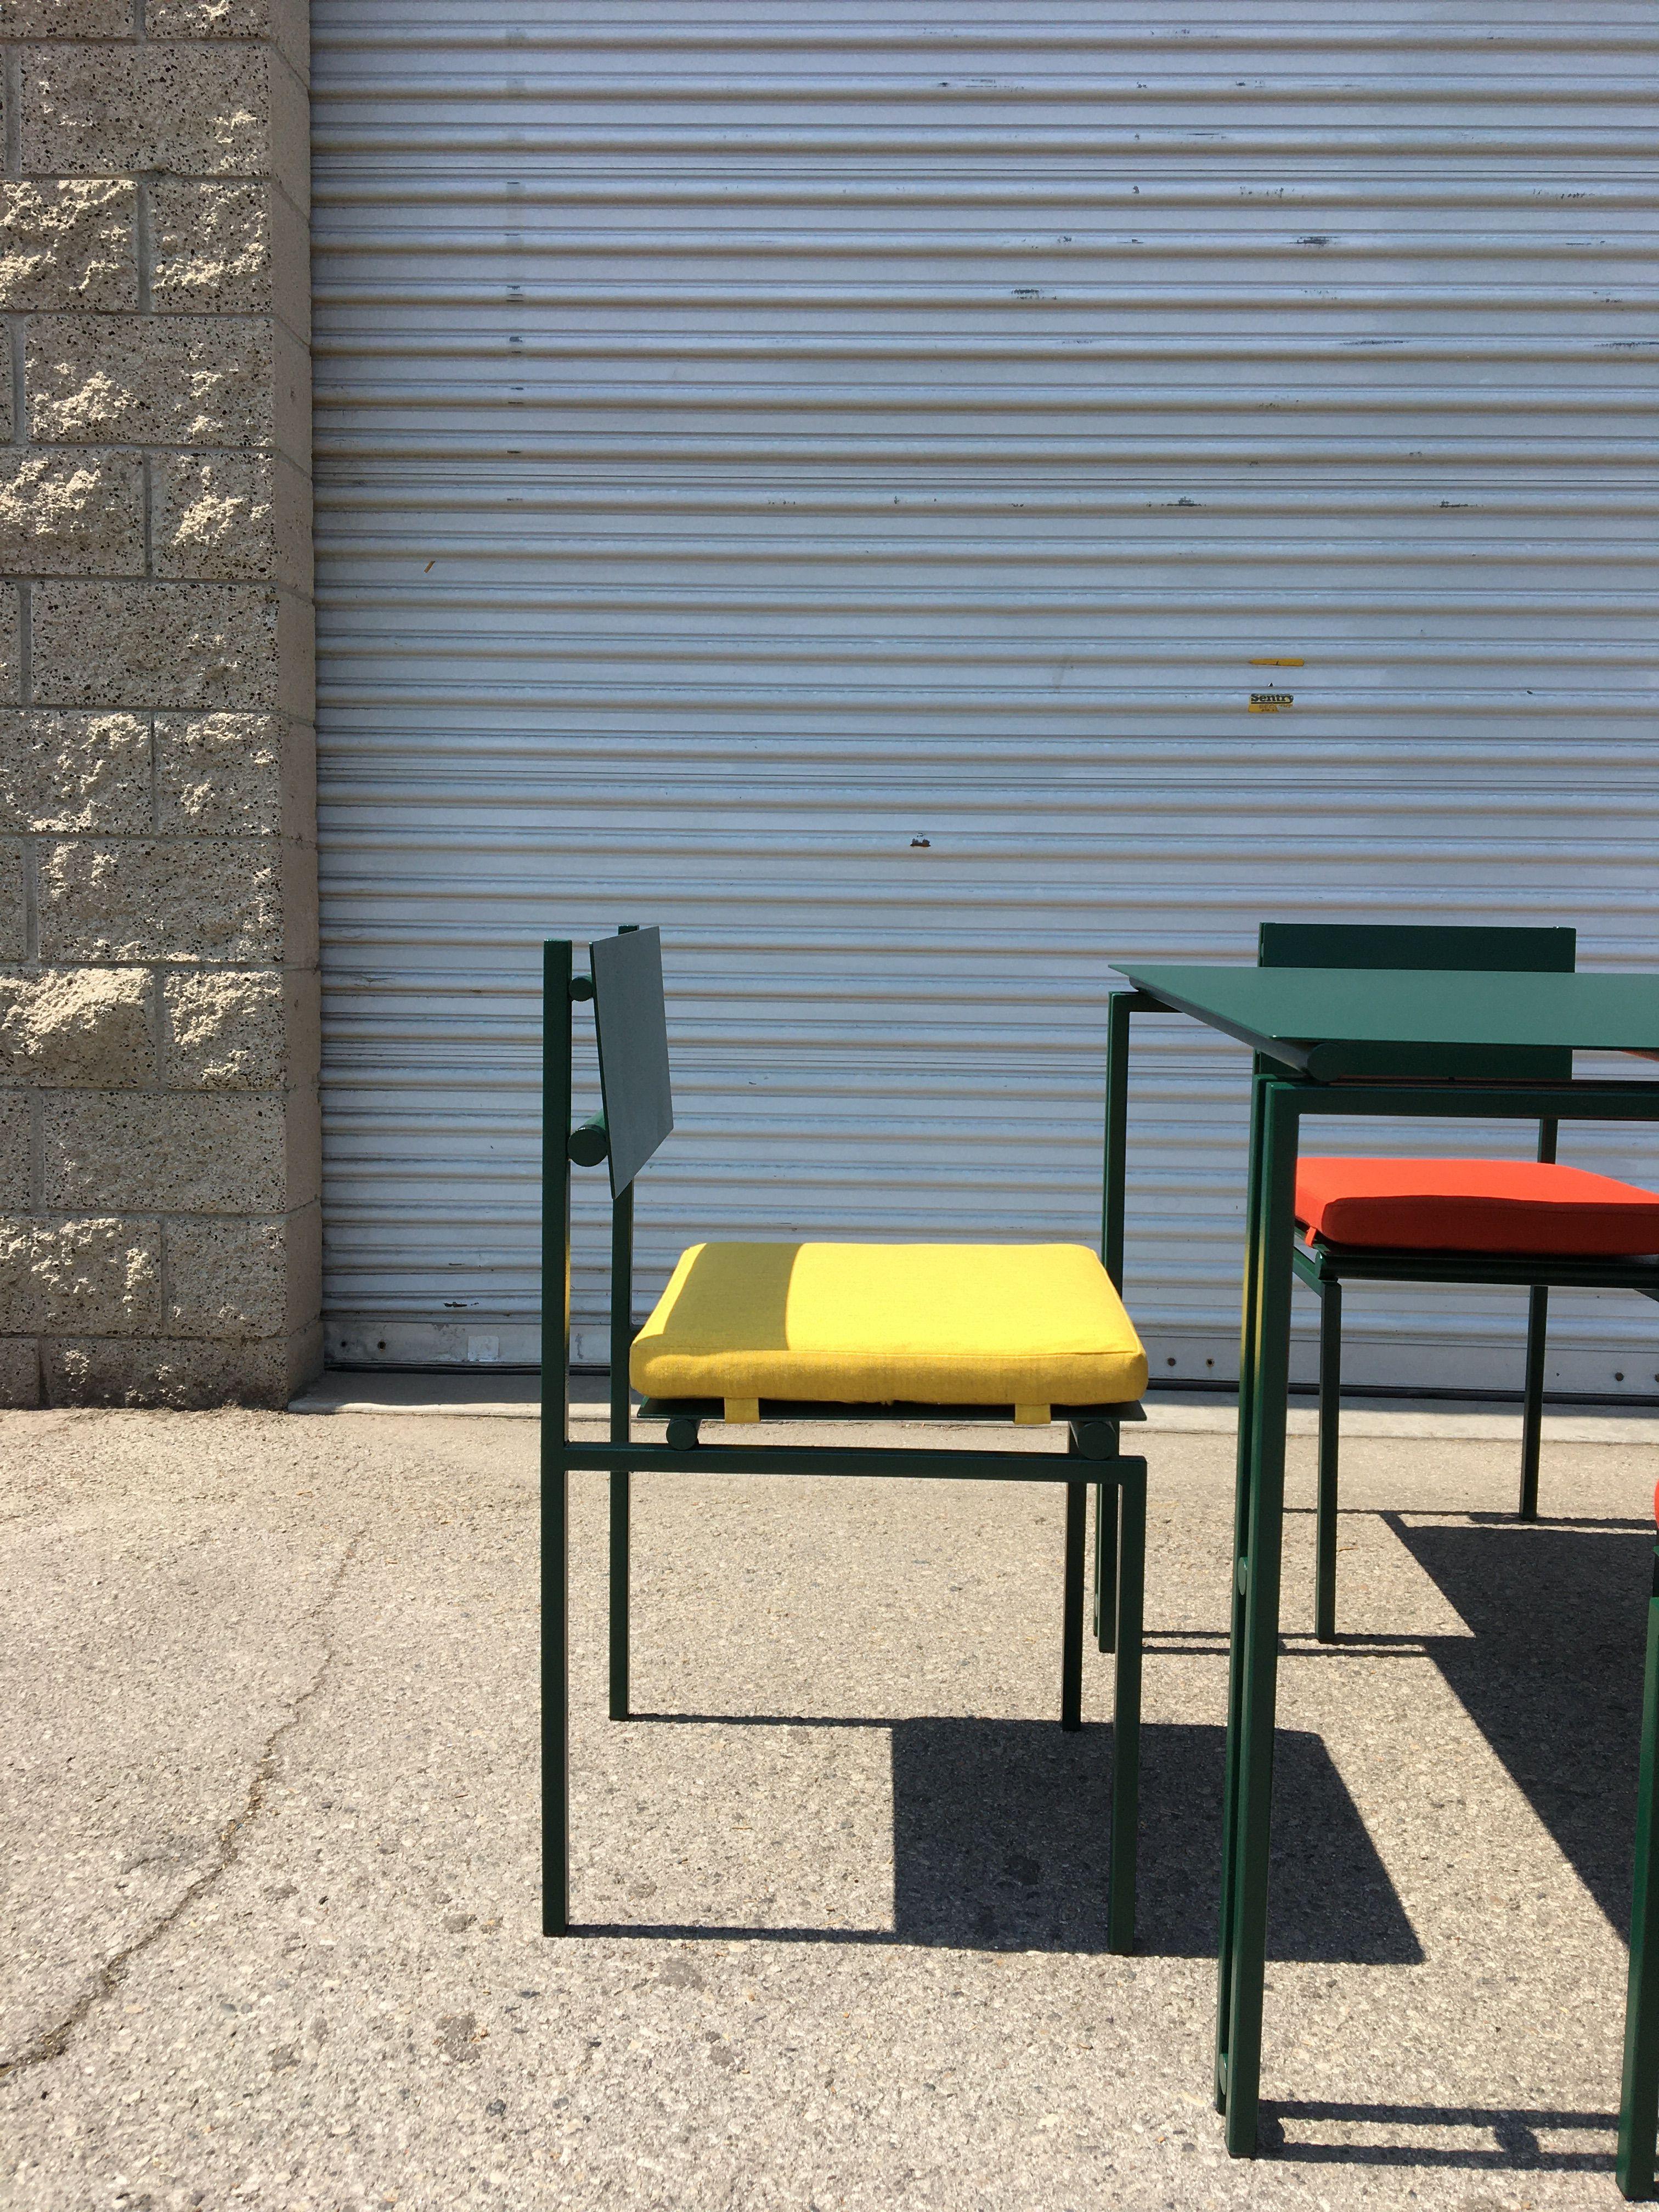 Suspension Metal Set - Breakfast Size product image 2